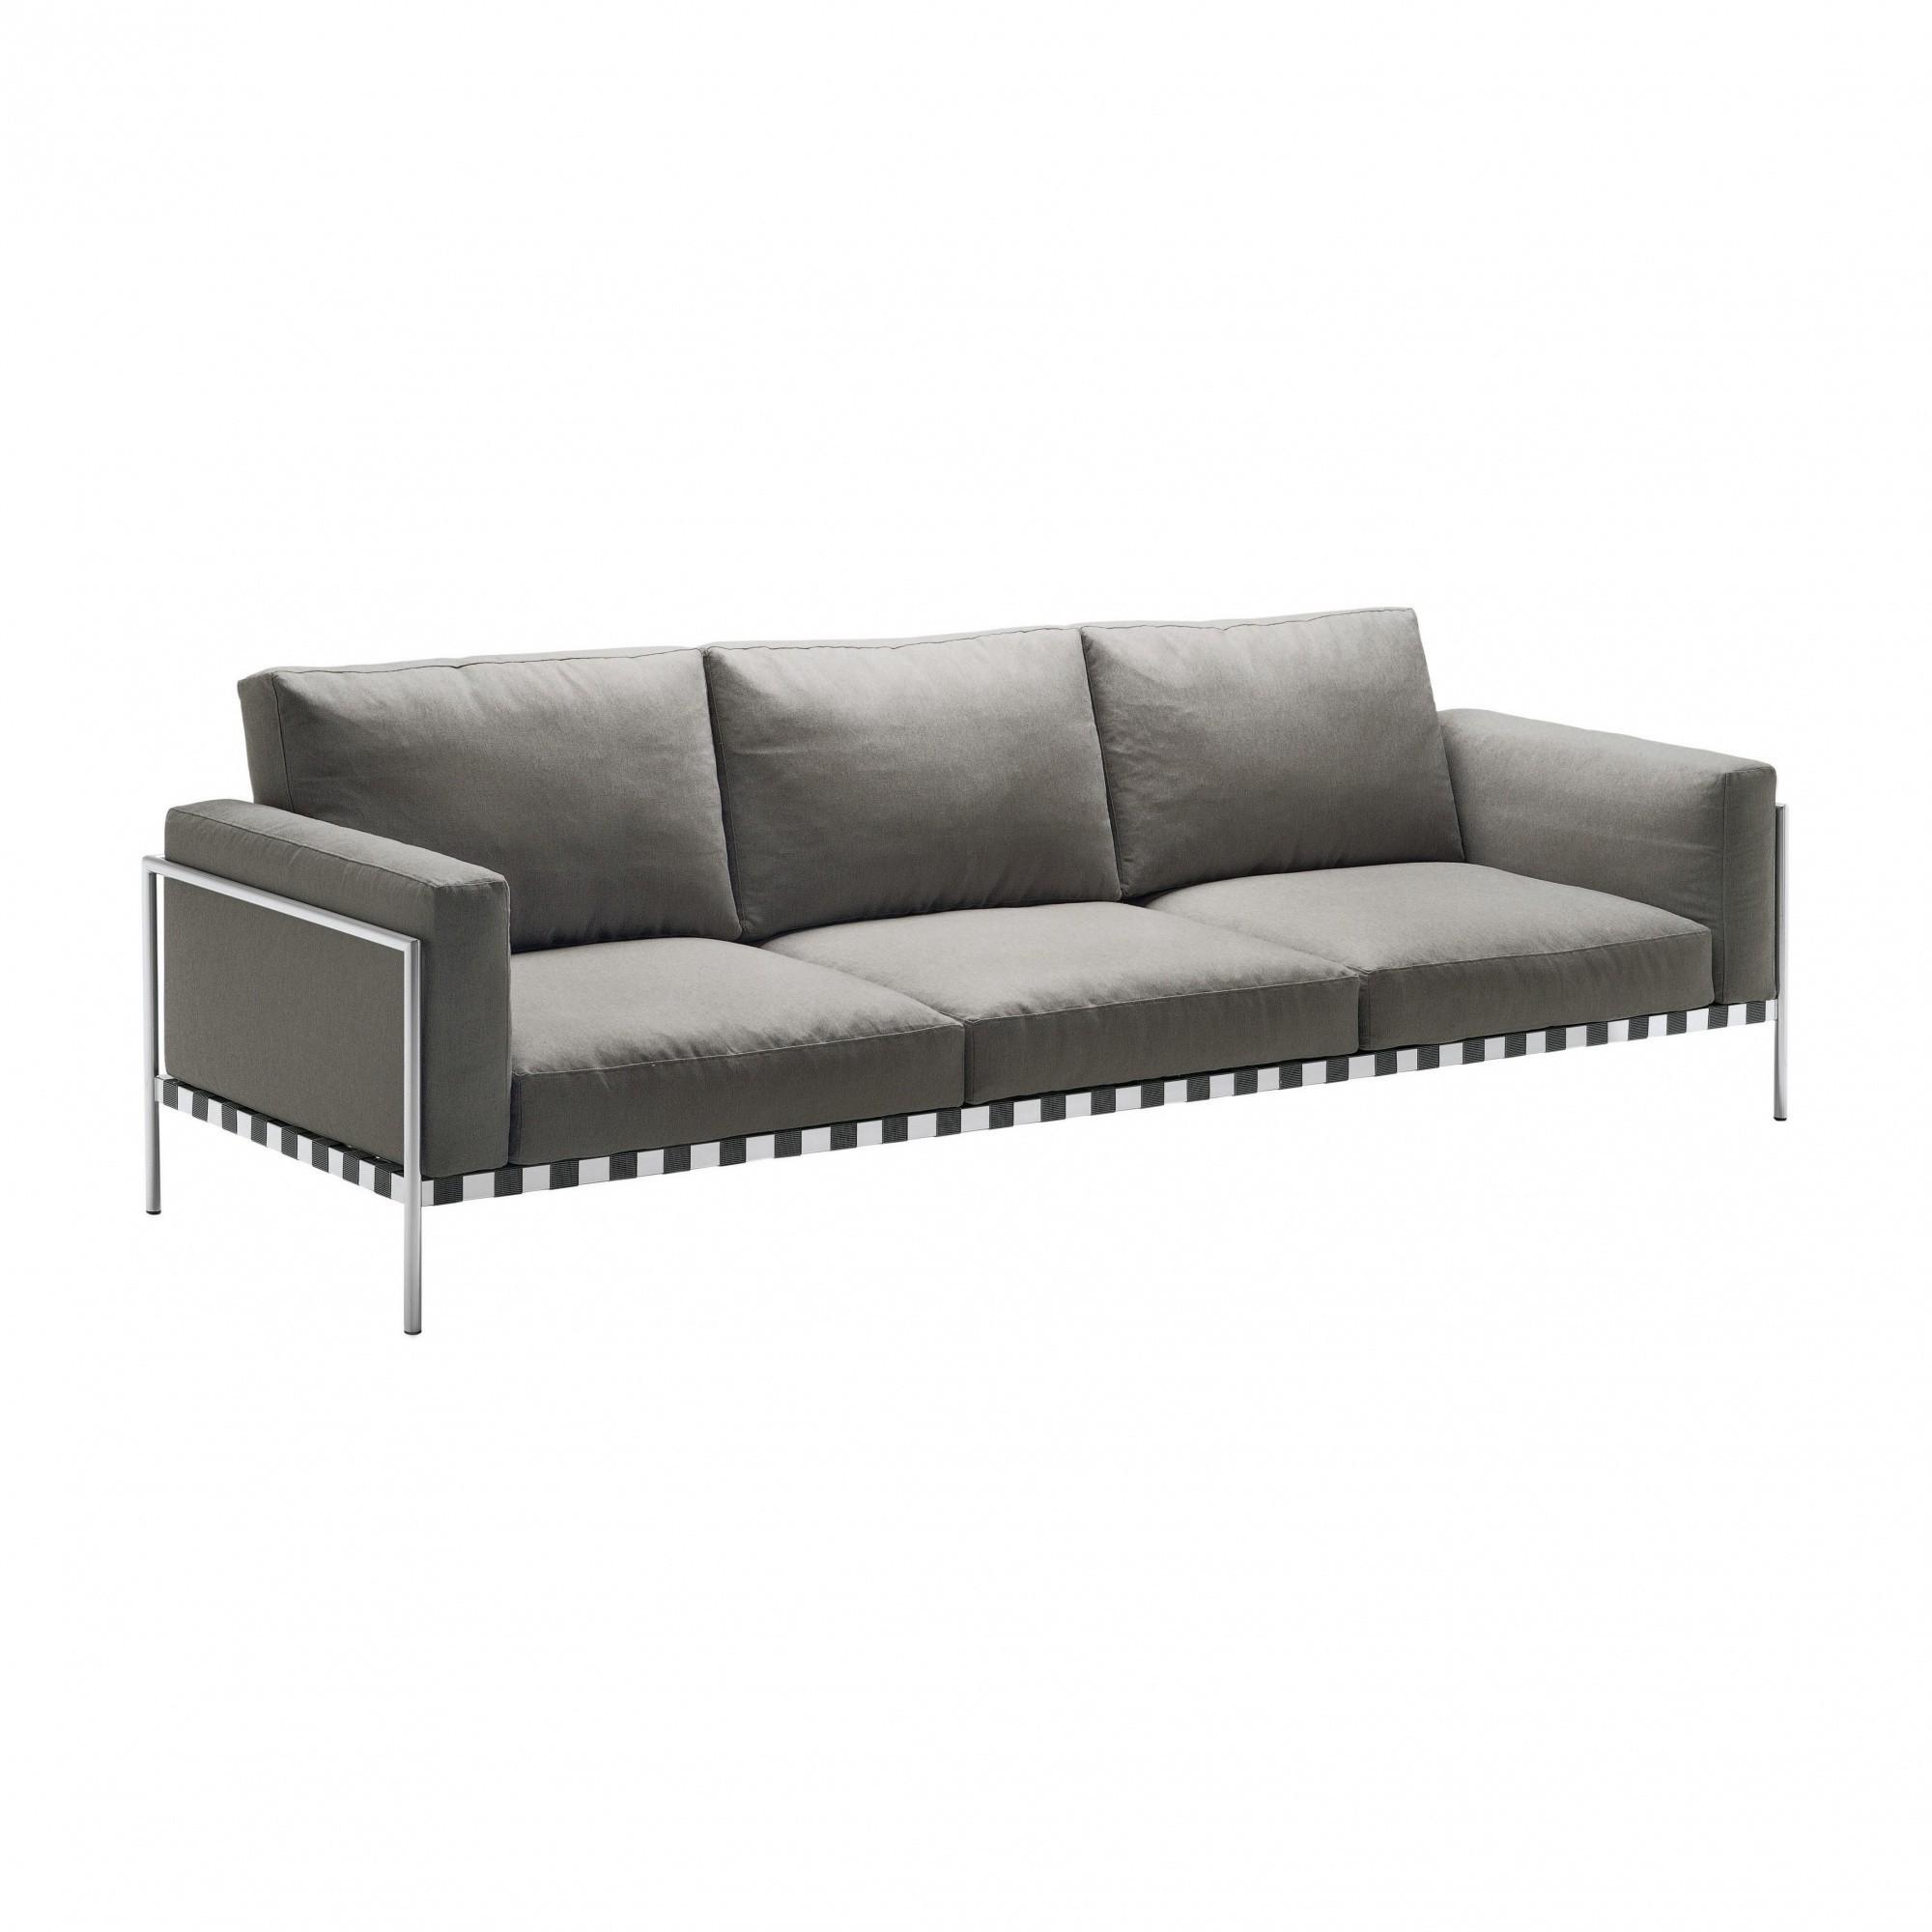 bauhaus sofas cama gray leather sofa set zanotta parco indoor 3 seater ambientedirect grey fabrics